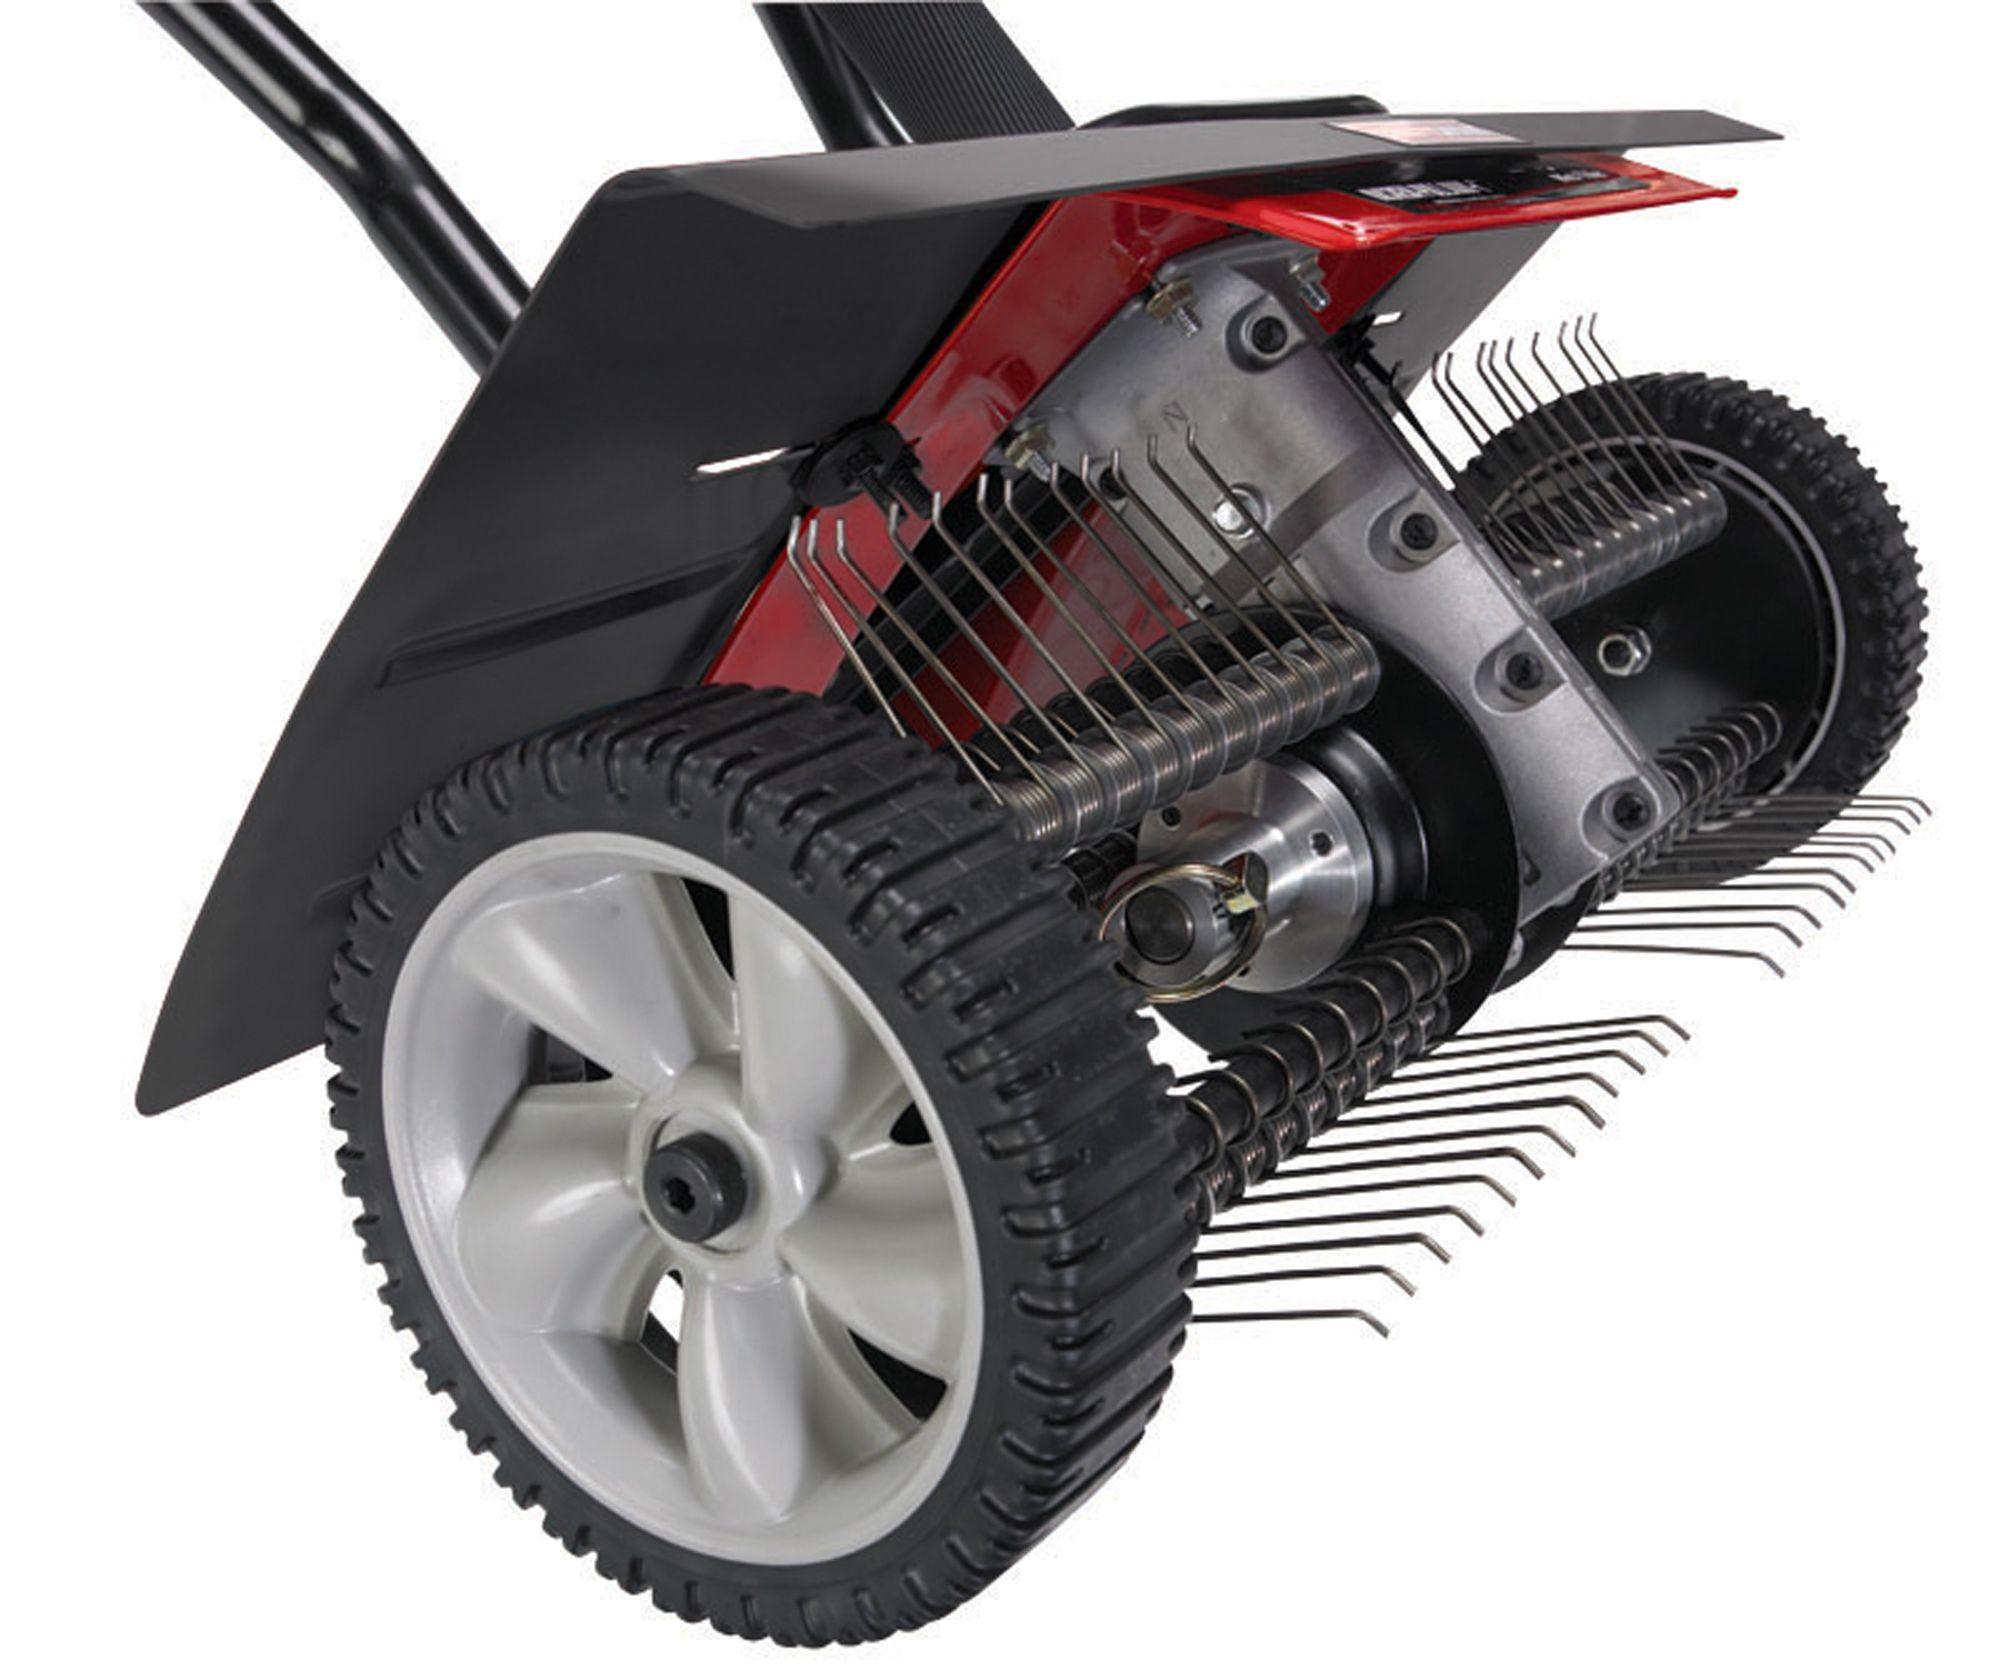 Craftsman MiniTiller Dethatcher Attachment